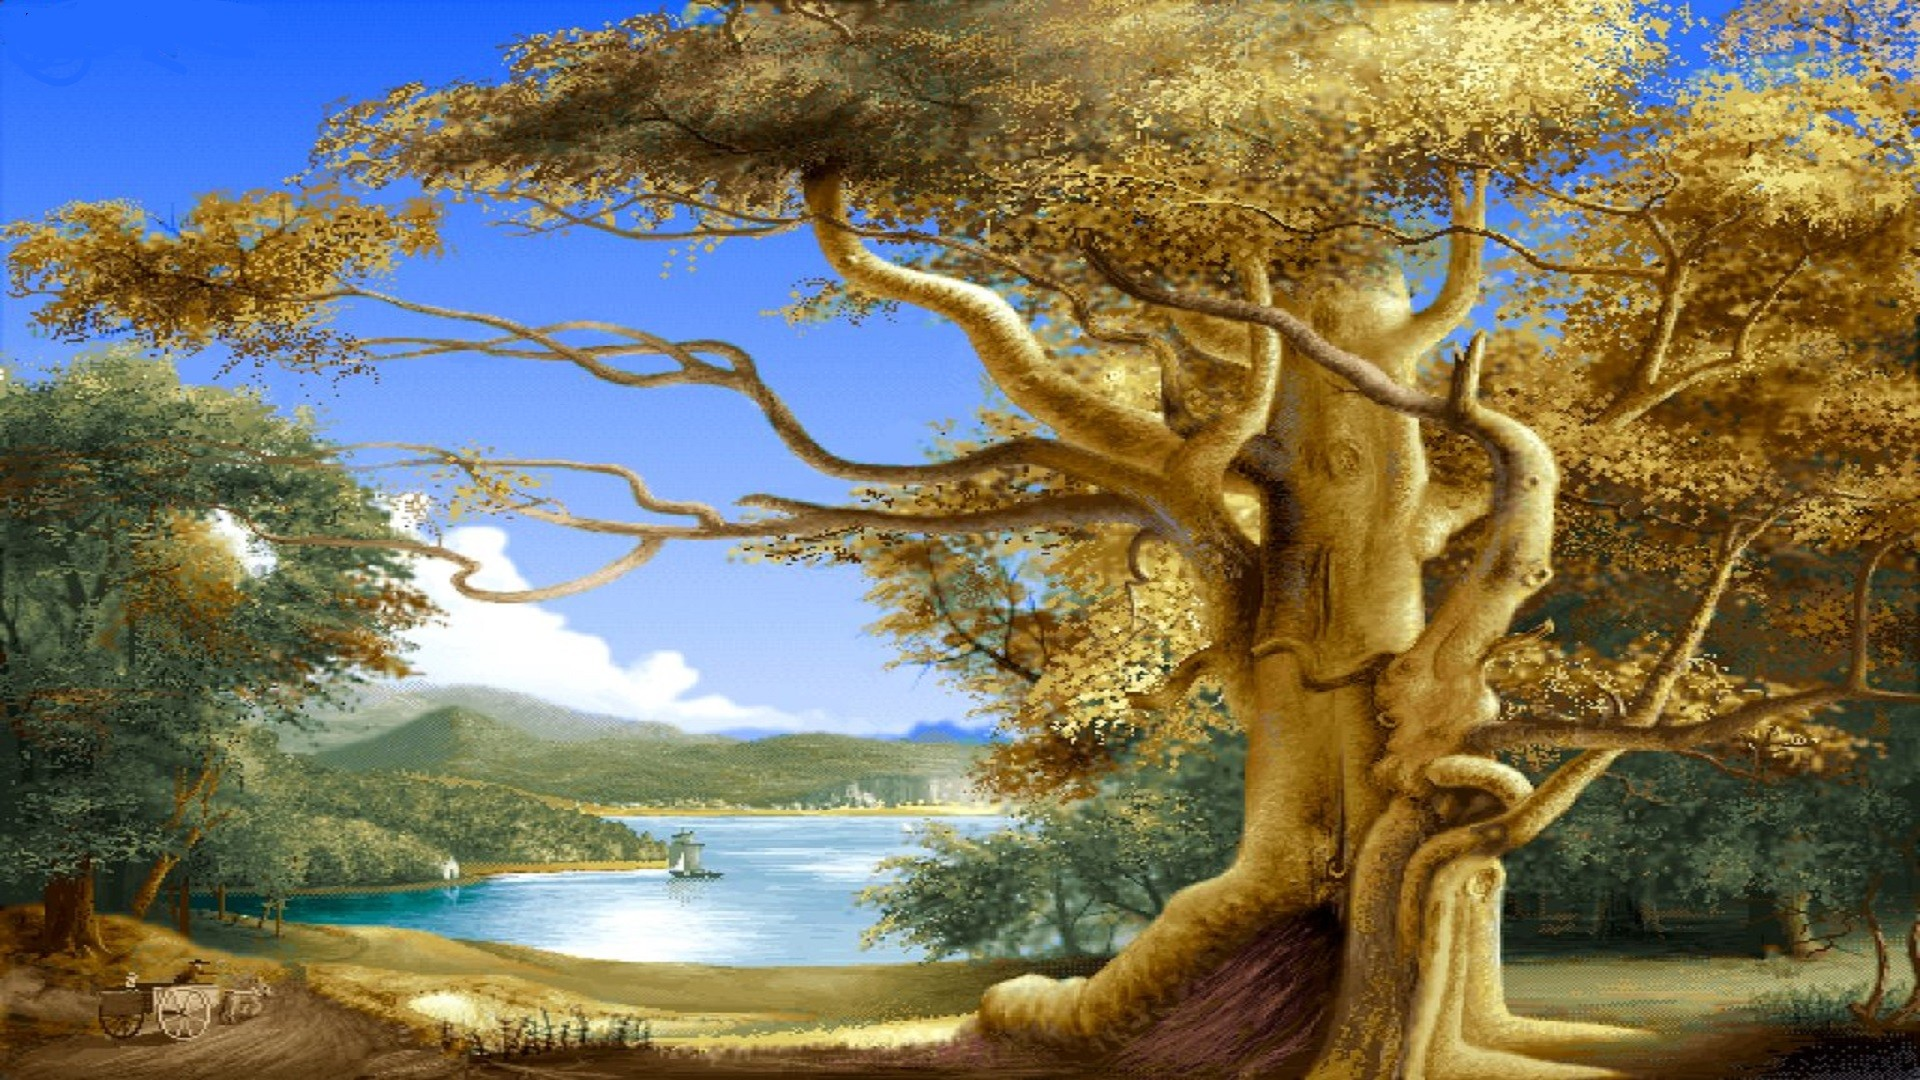 Browsing-Nature-Wallpapers-free-hd-for-desktop